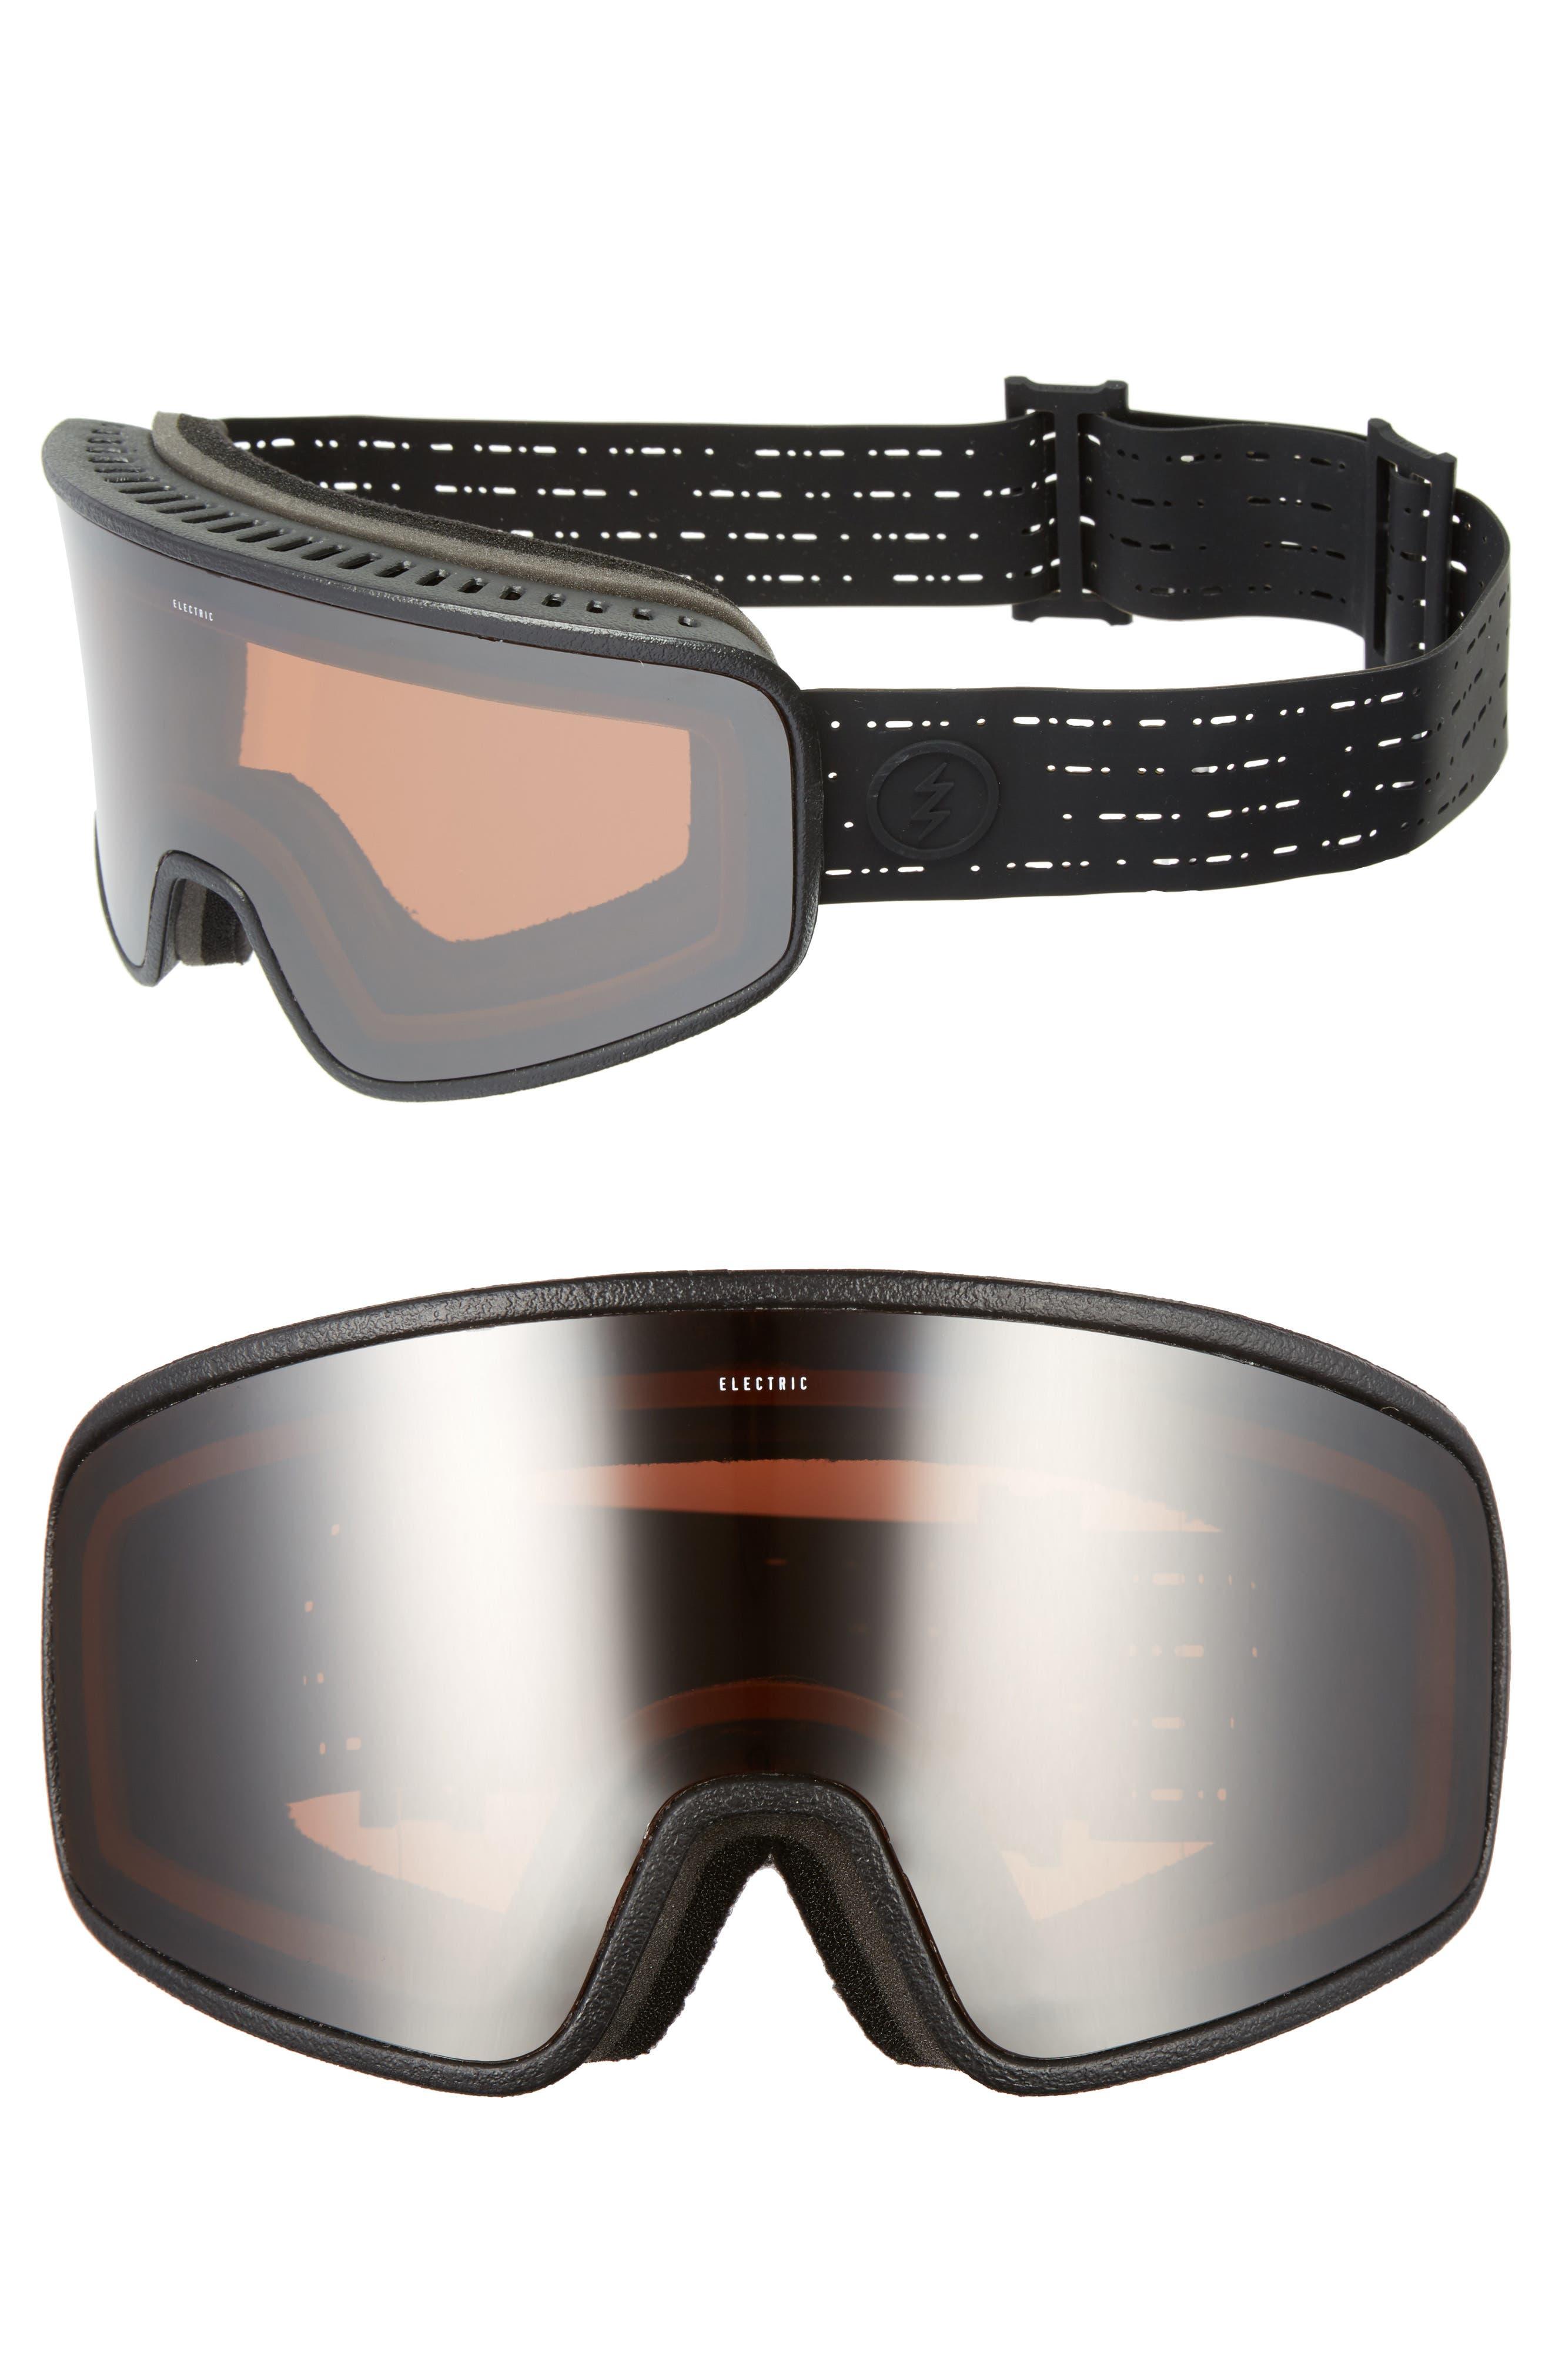 Electrolite 215mm Snow Goggles,                         Main,                         color, 002